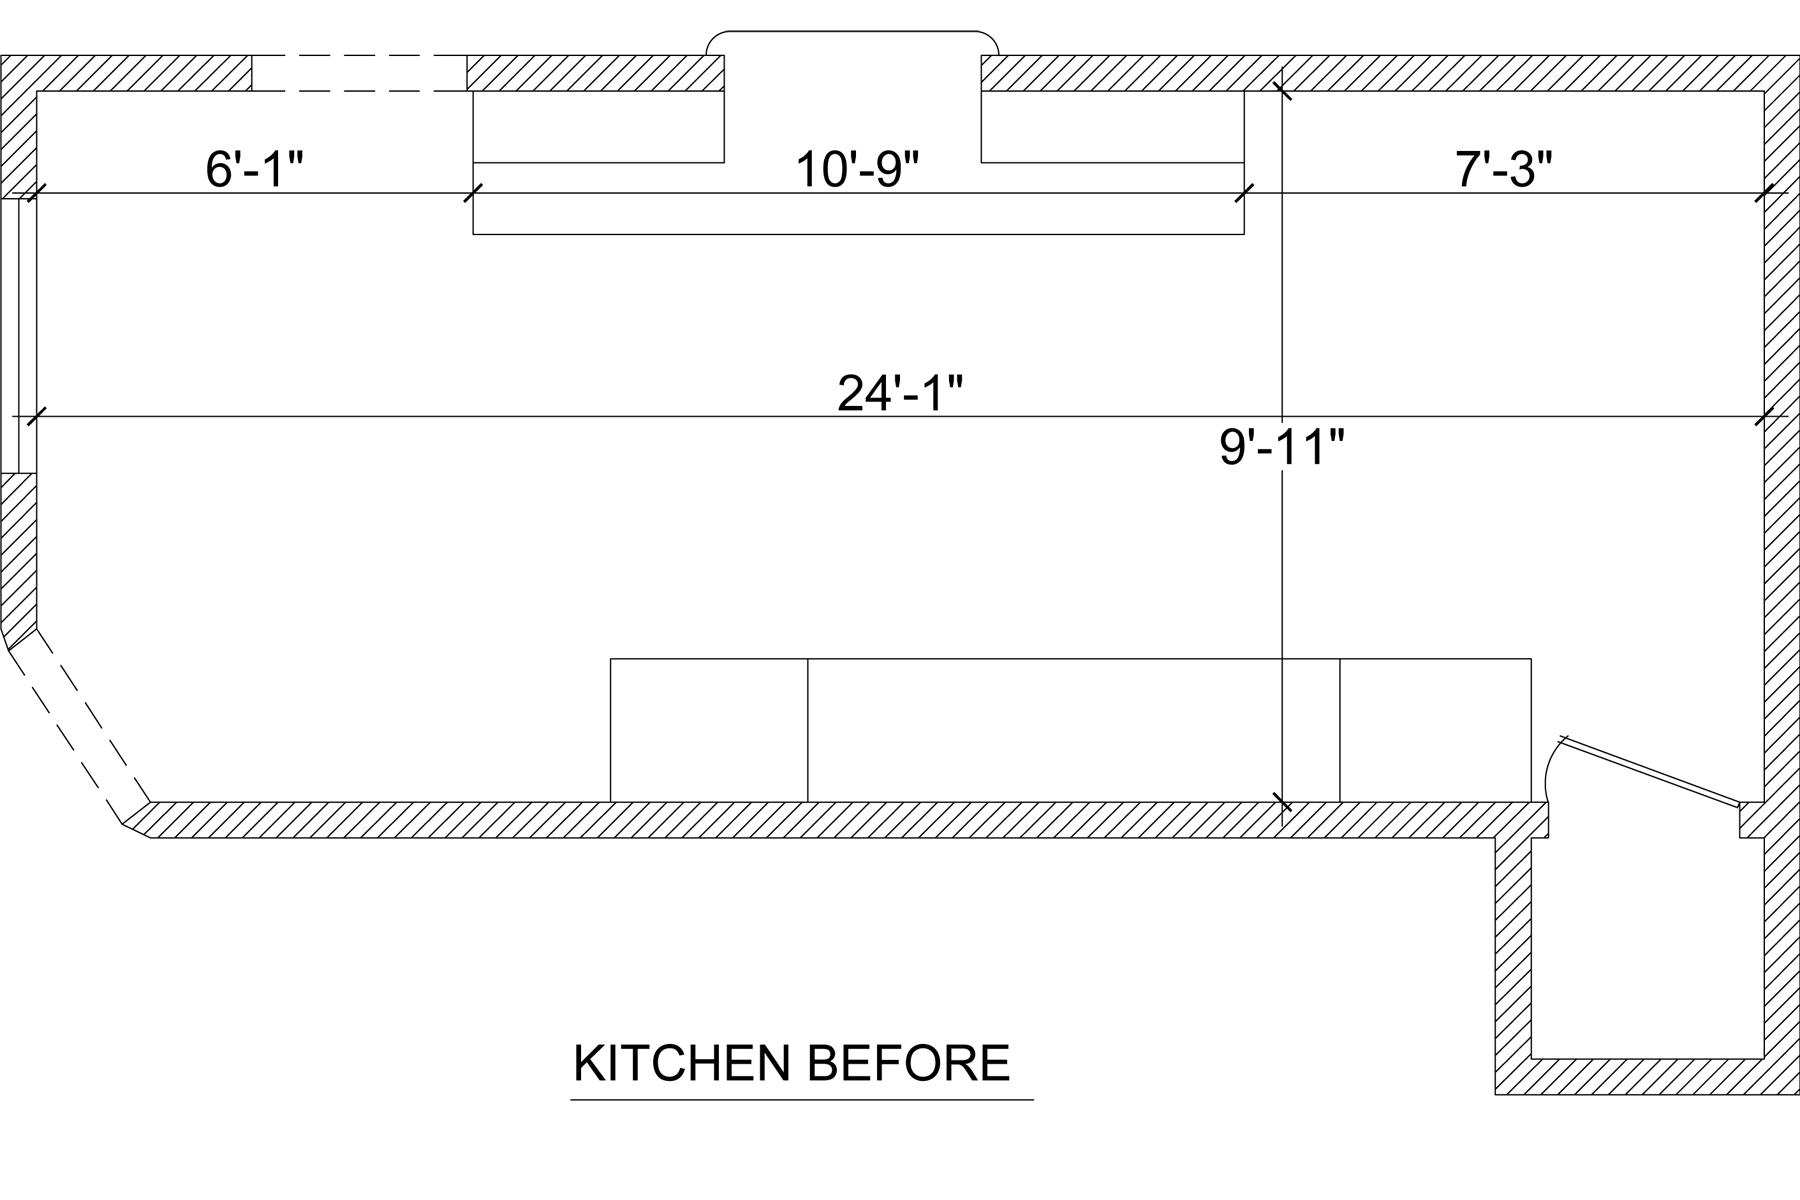 Floor-plan of the original kitchen | Jamie House Design